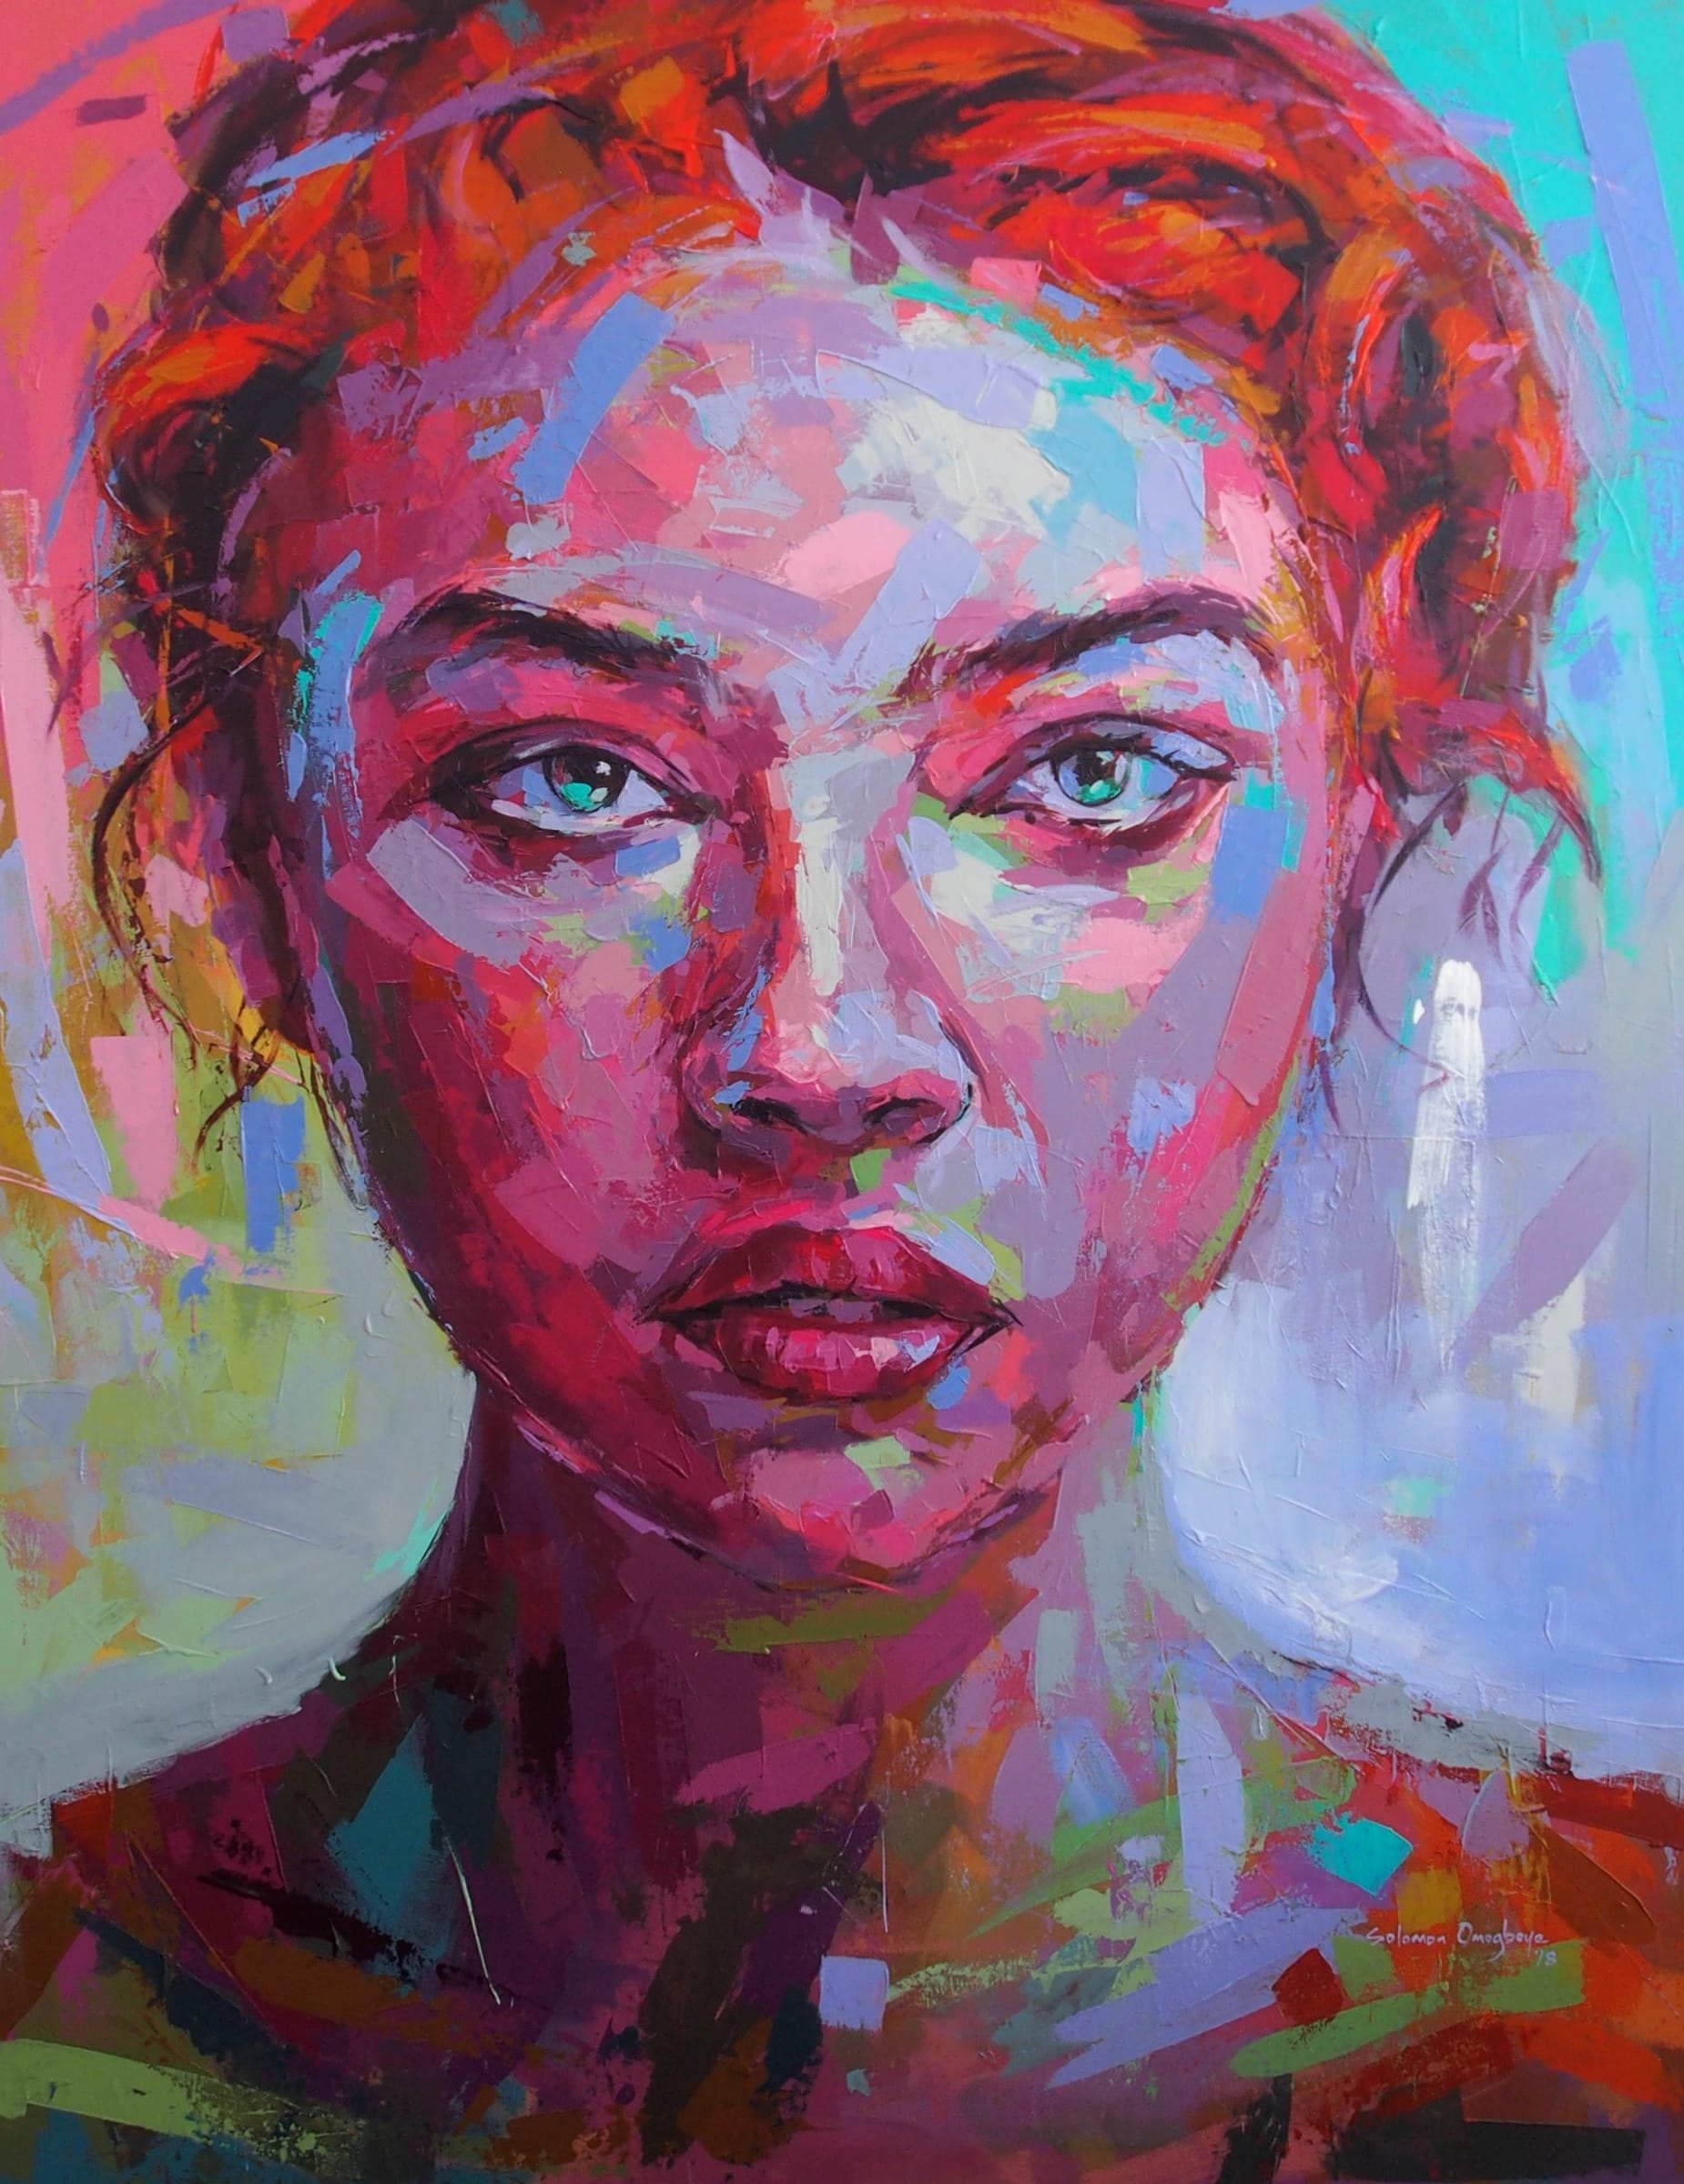 <span class=&#34;link fancybox-details-link&#34;><a href=&#34;/artists/39-solomon-omogboye/works/2020-solomon-omogboye-rainbow-gaze-2018/&#34;>View Detail Page</a></span><div class=&#34;artist&#34;><strong>Solomon Omogboye</strong></div> <div class=&#34;title&#34;><em>Rainbow Gaze</em>, 2018</div> <div class=&#34;medium&#34;>Acrylic On Canvas</div> <div class=&#34;dimensions&#34;>148cm x 194cm</div>